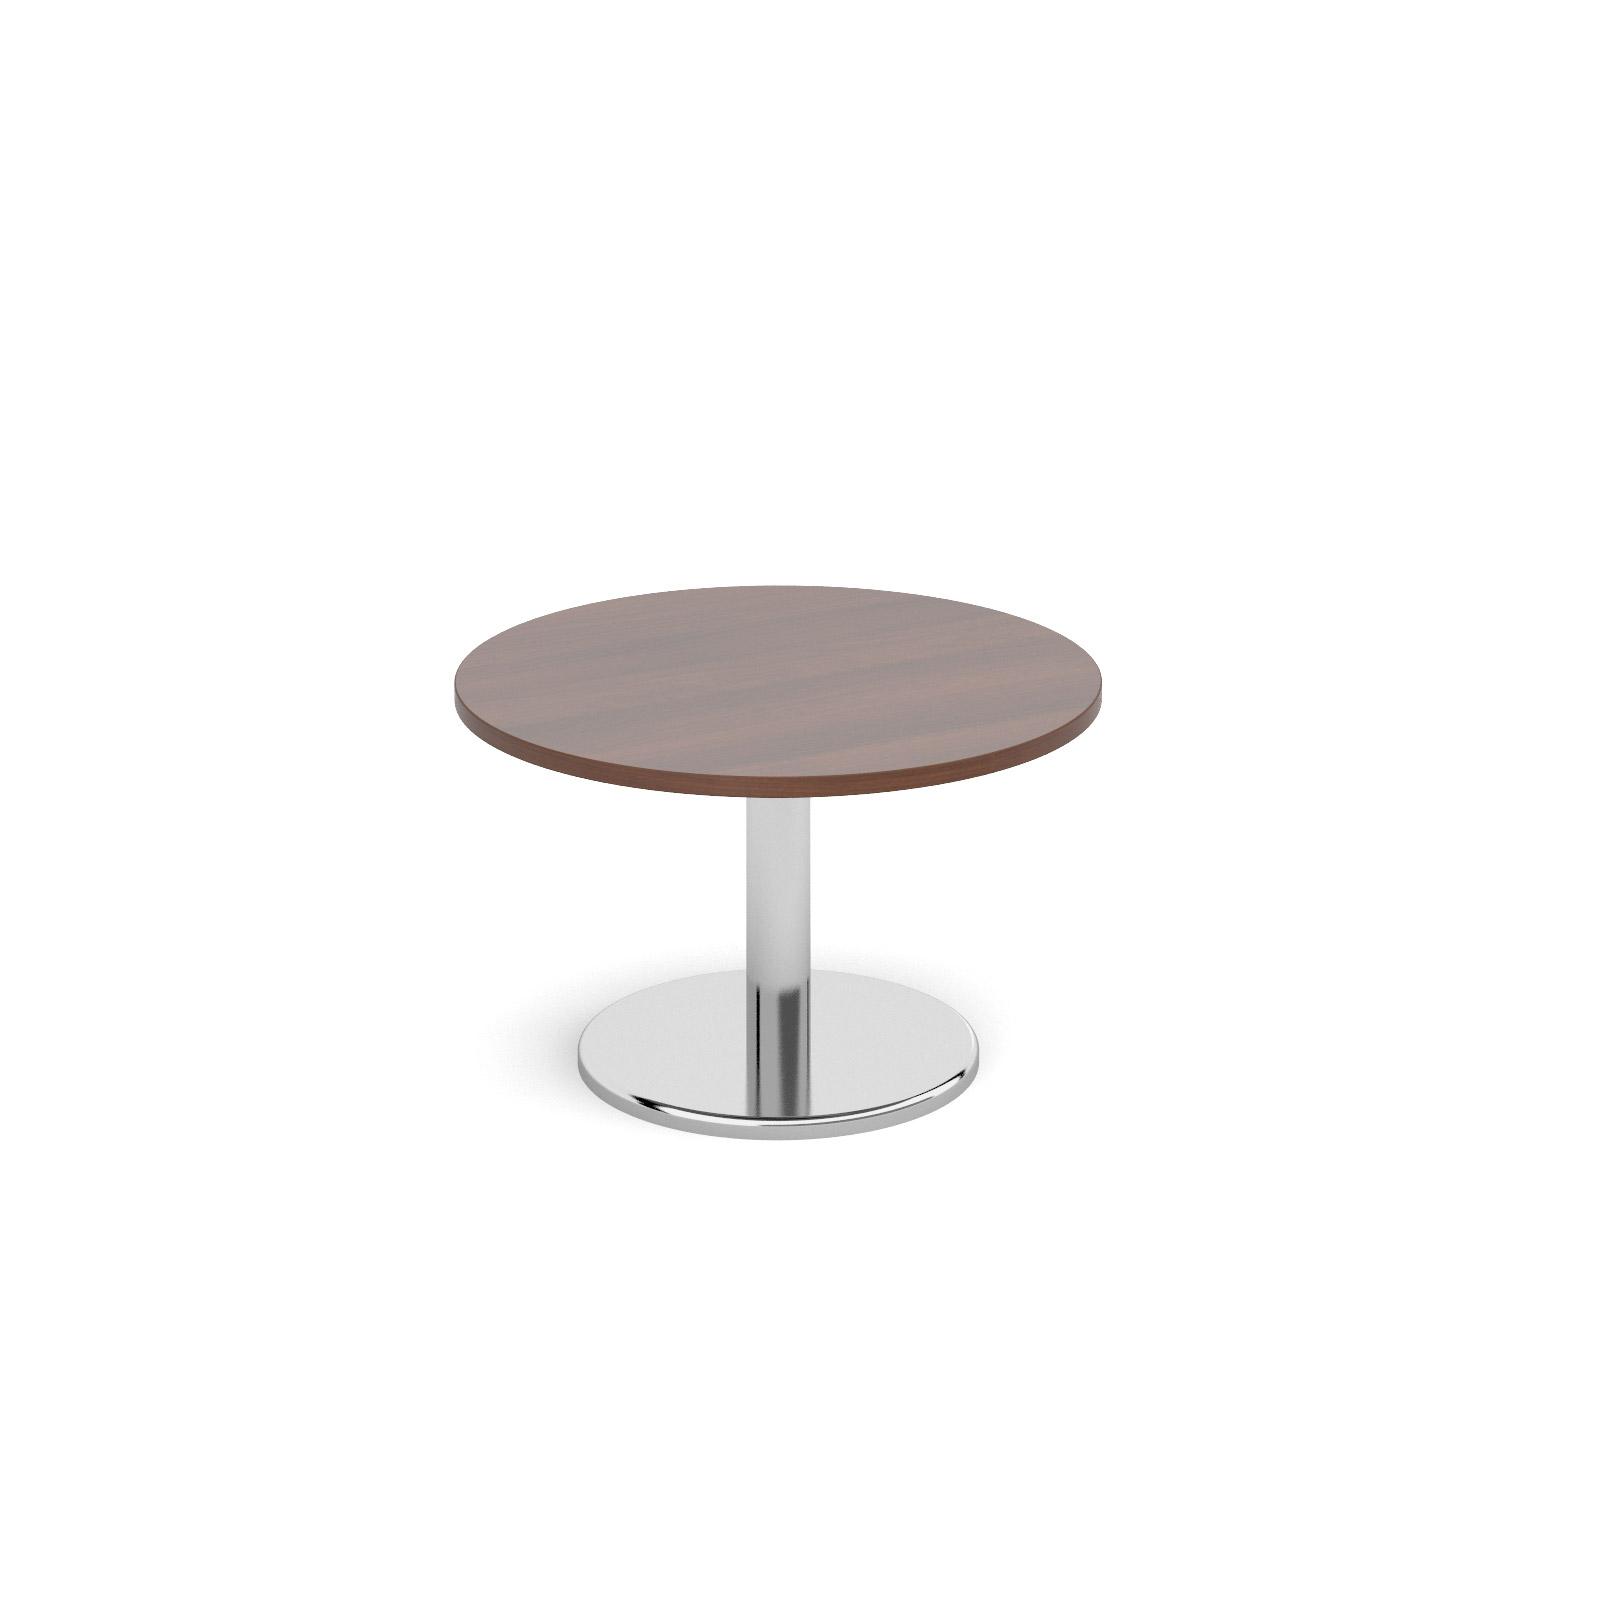 Circular coffee table with round chrome base 800mm - walnut